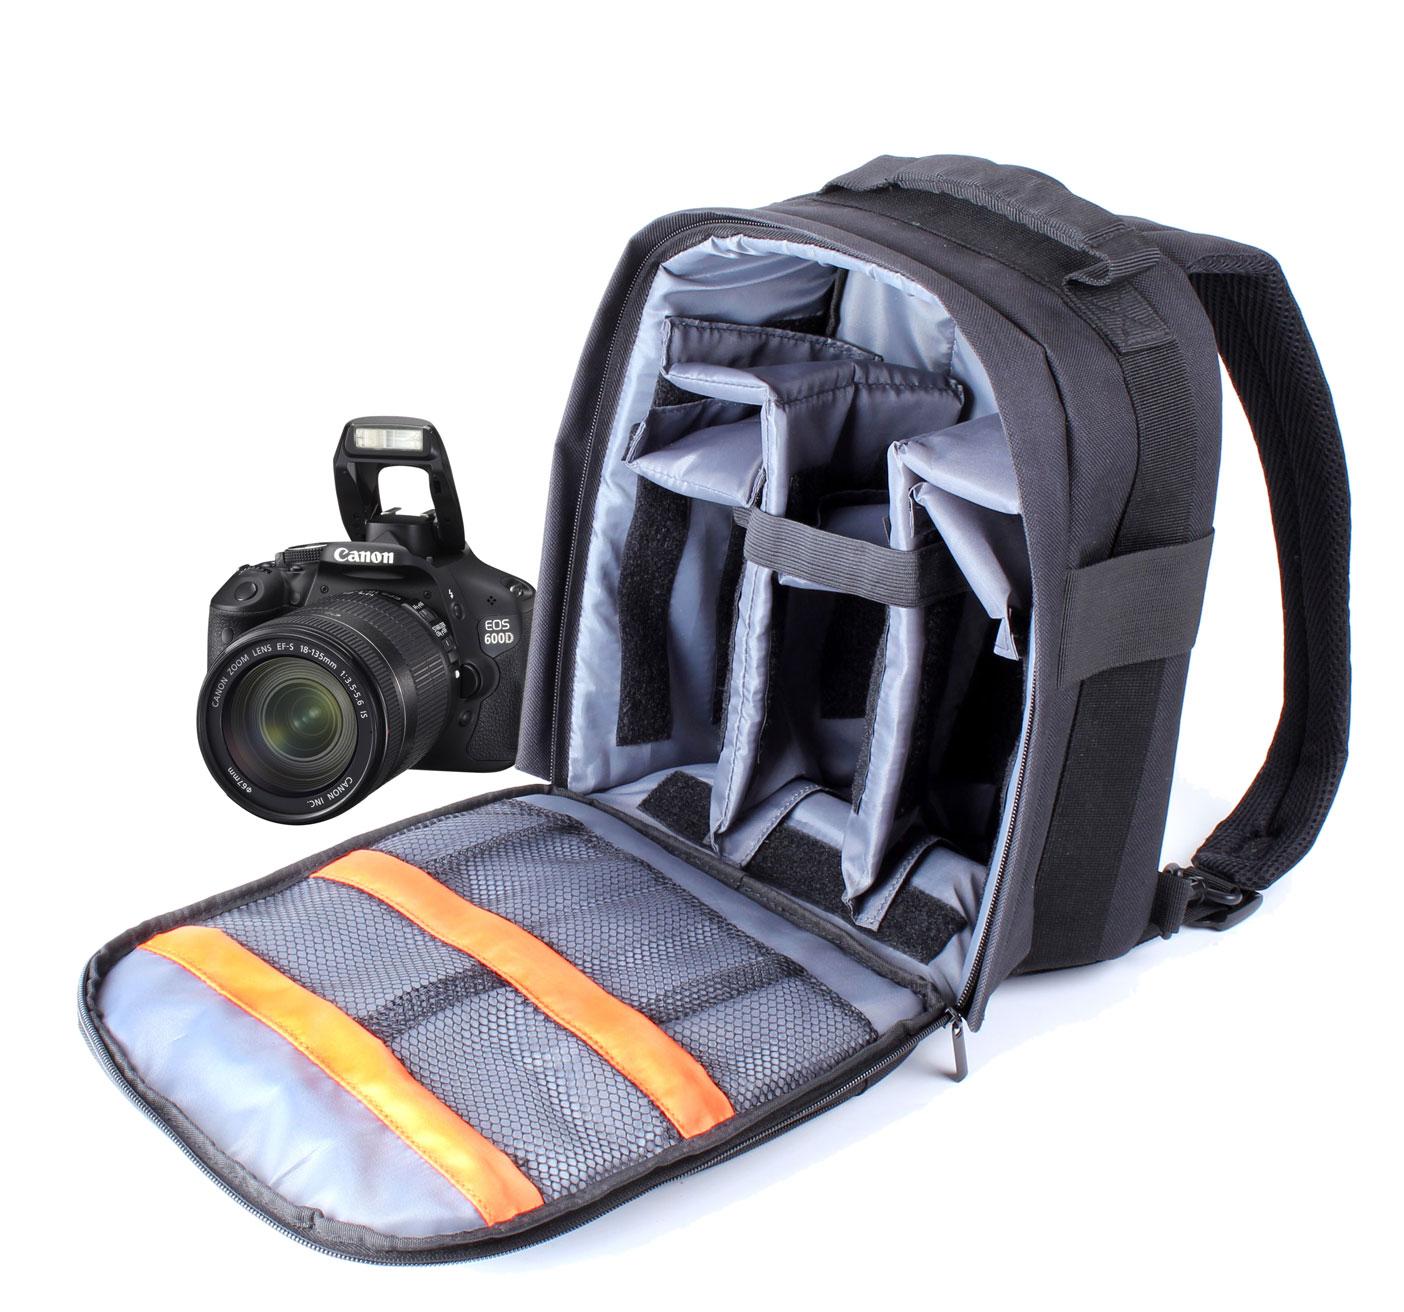 Camera Camera Bags For Dslr Canon slr dslr camera rucksackbackpack fits canon eos 60d 5d mark ii thumbnail 1